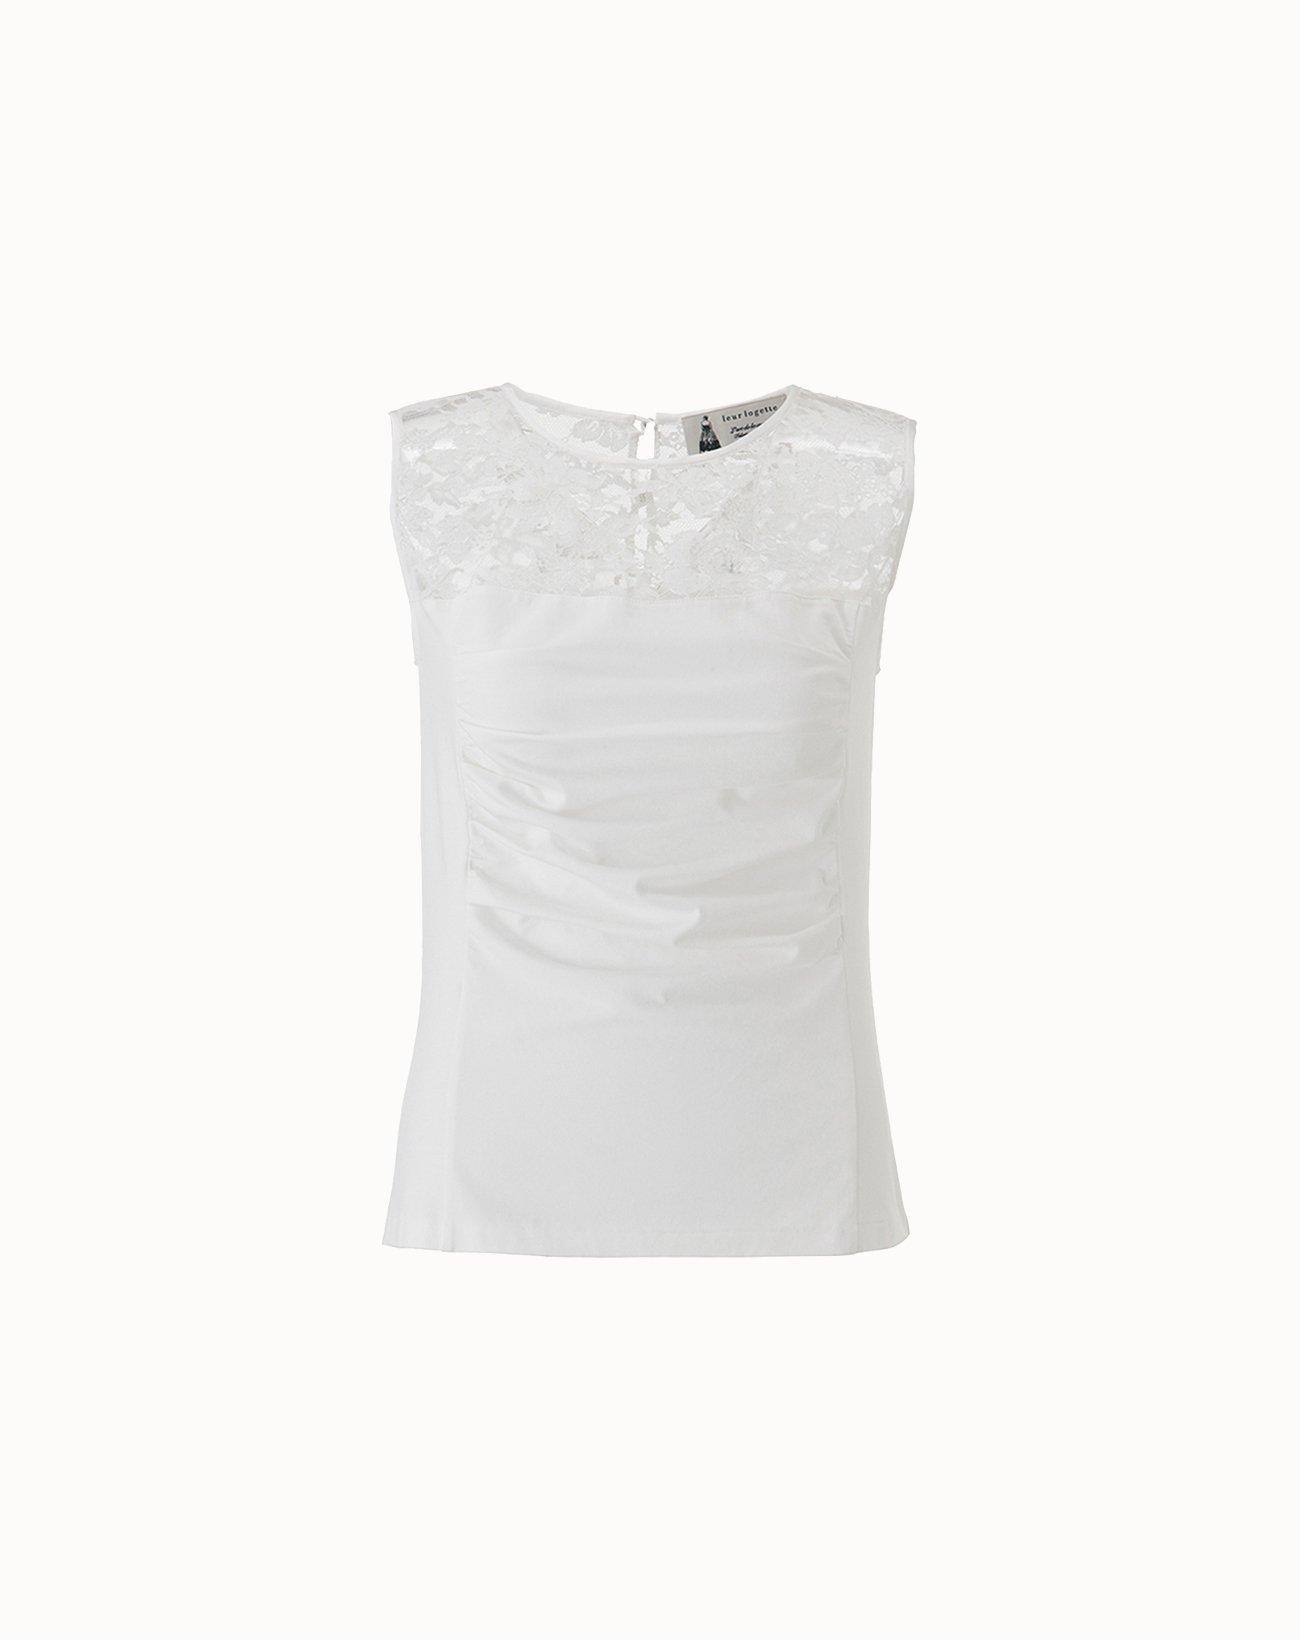 leur logette - Stretch Cotton Sleeveless Top - White